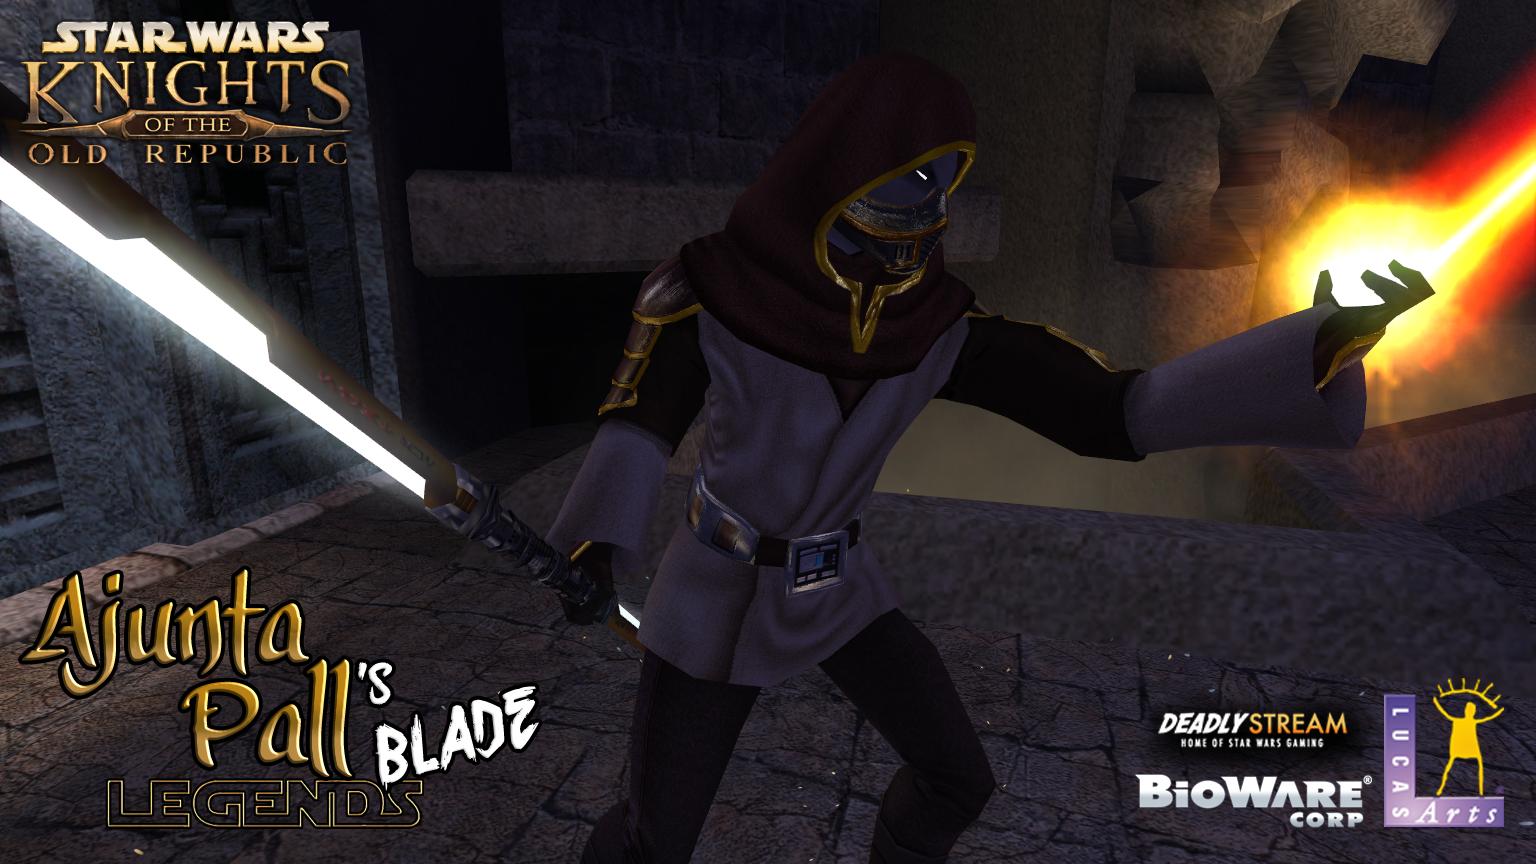 Ajunta Pall's Blade 'Legends' [Poster-trailer]